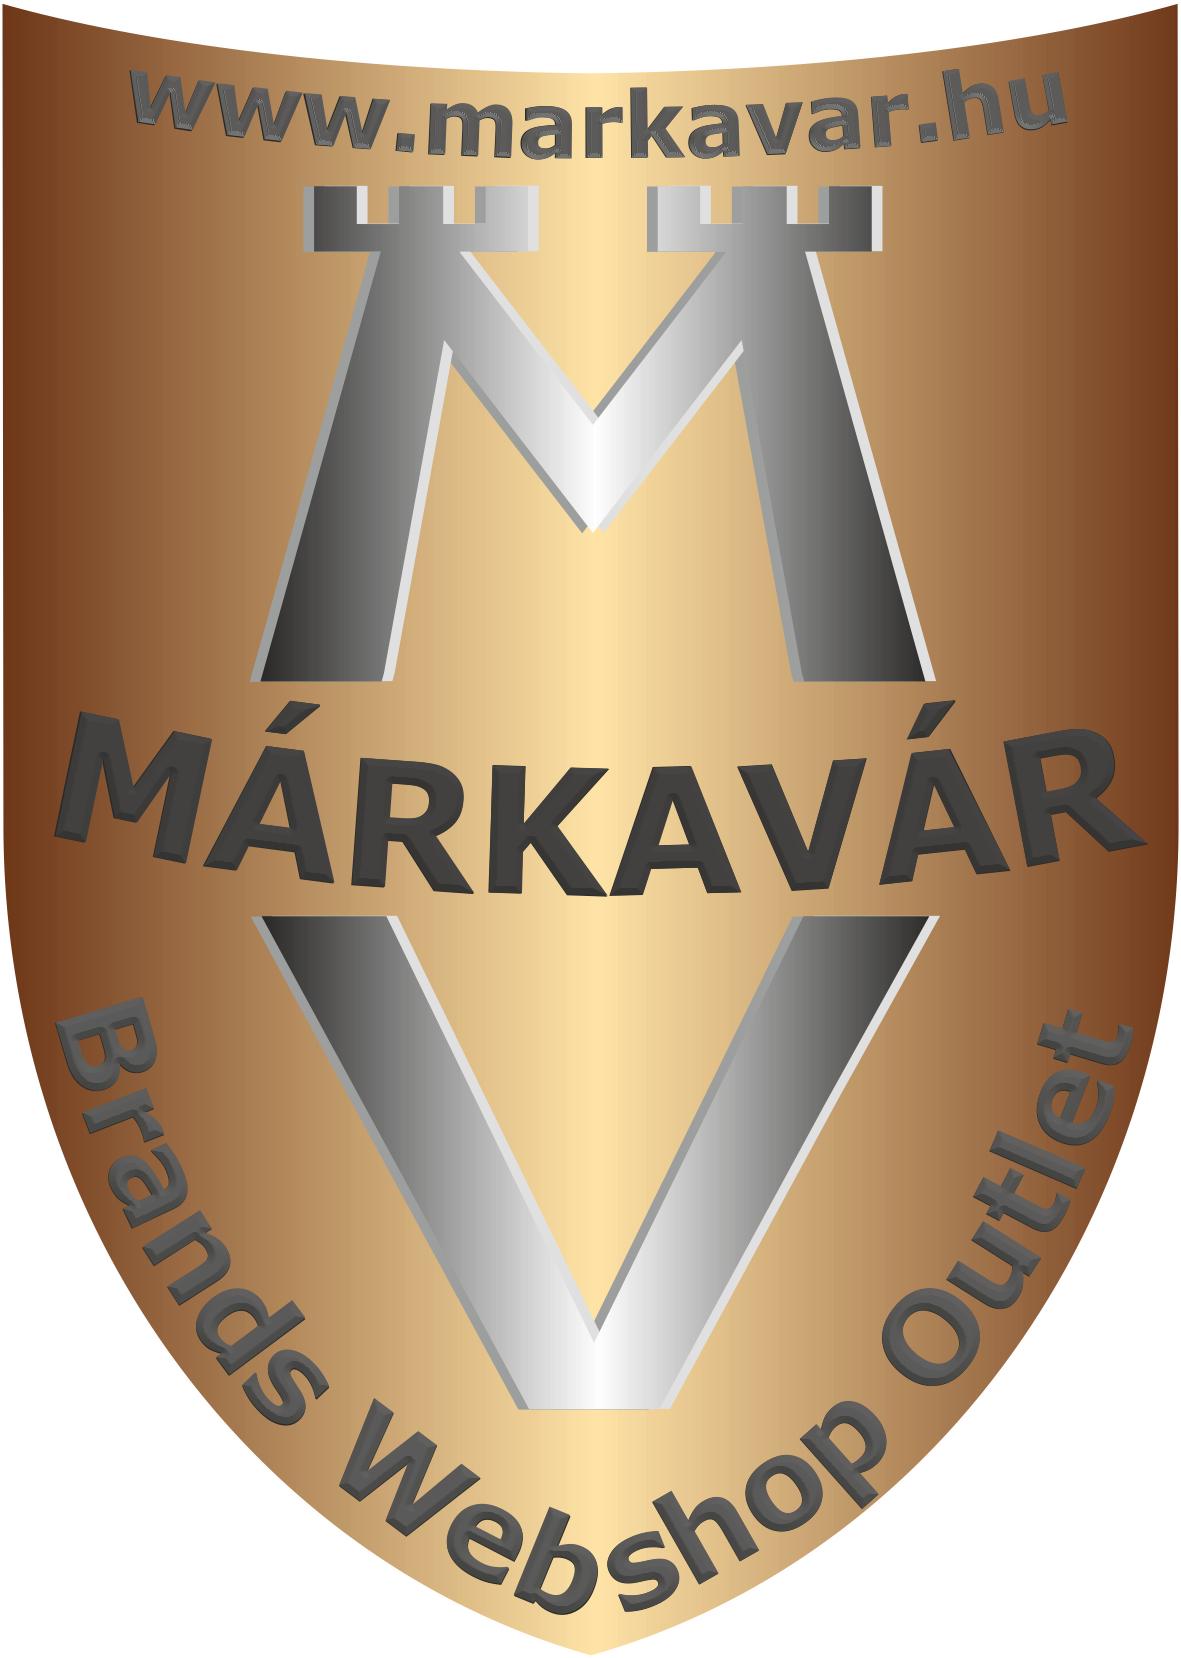 www.markavar.hu